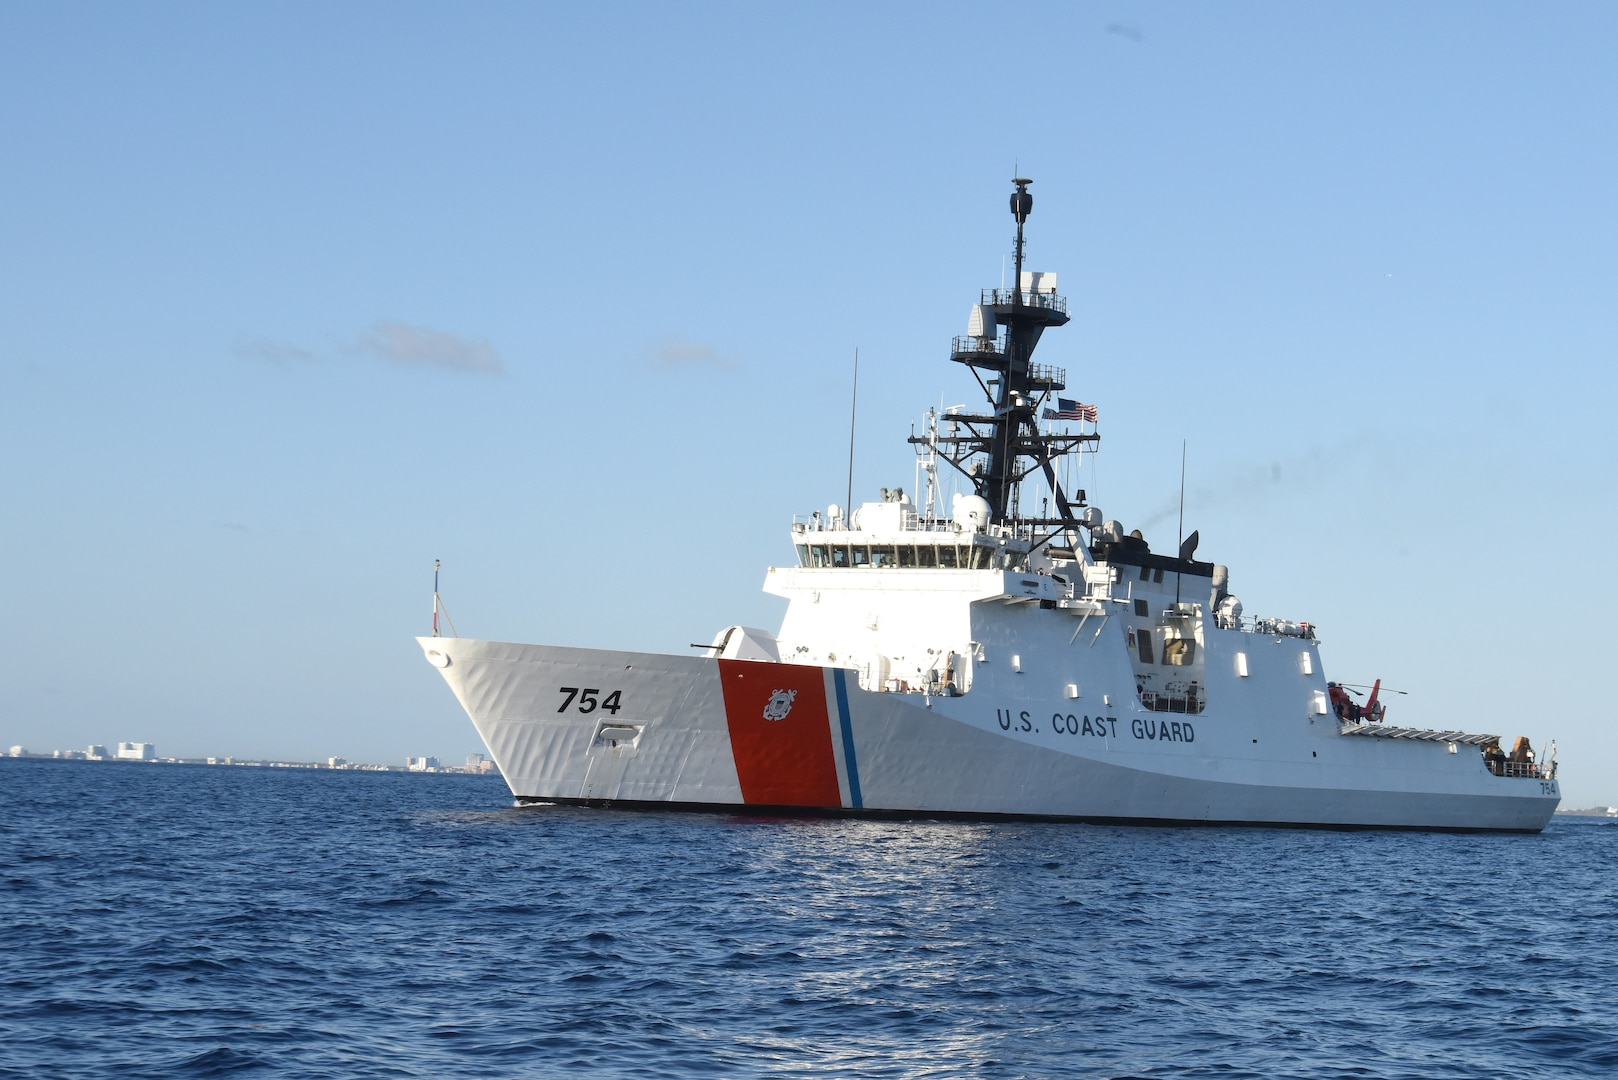 The U.S. Coast Guard Cutter James transits the Atlantic Ocean March 29, 2017.